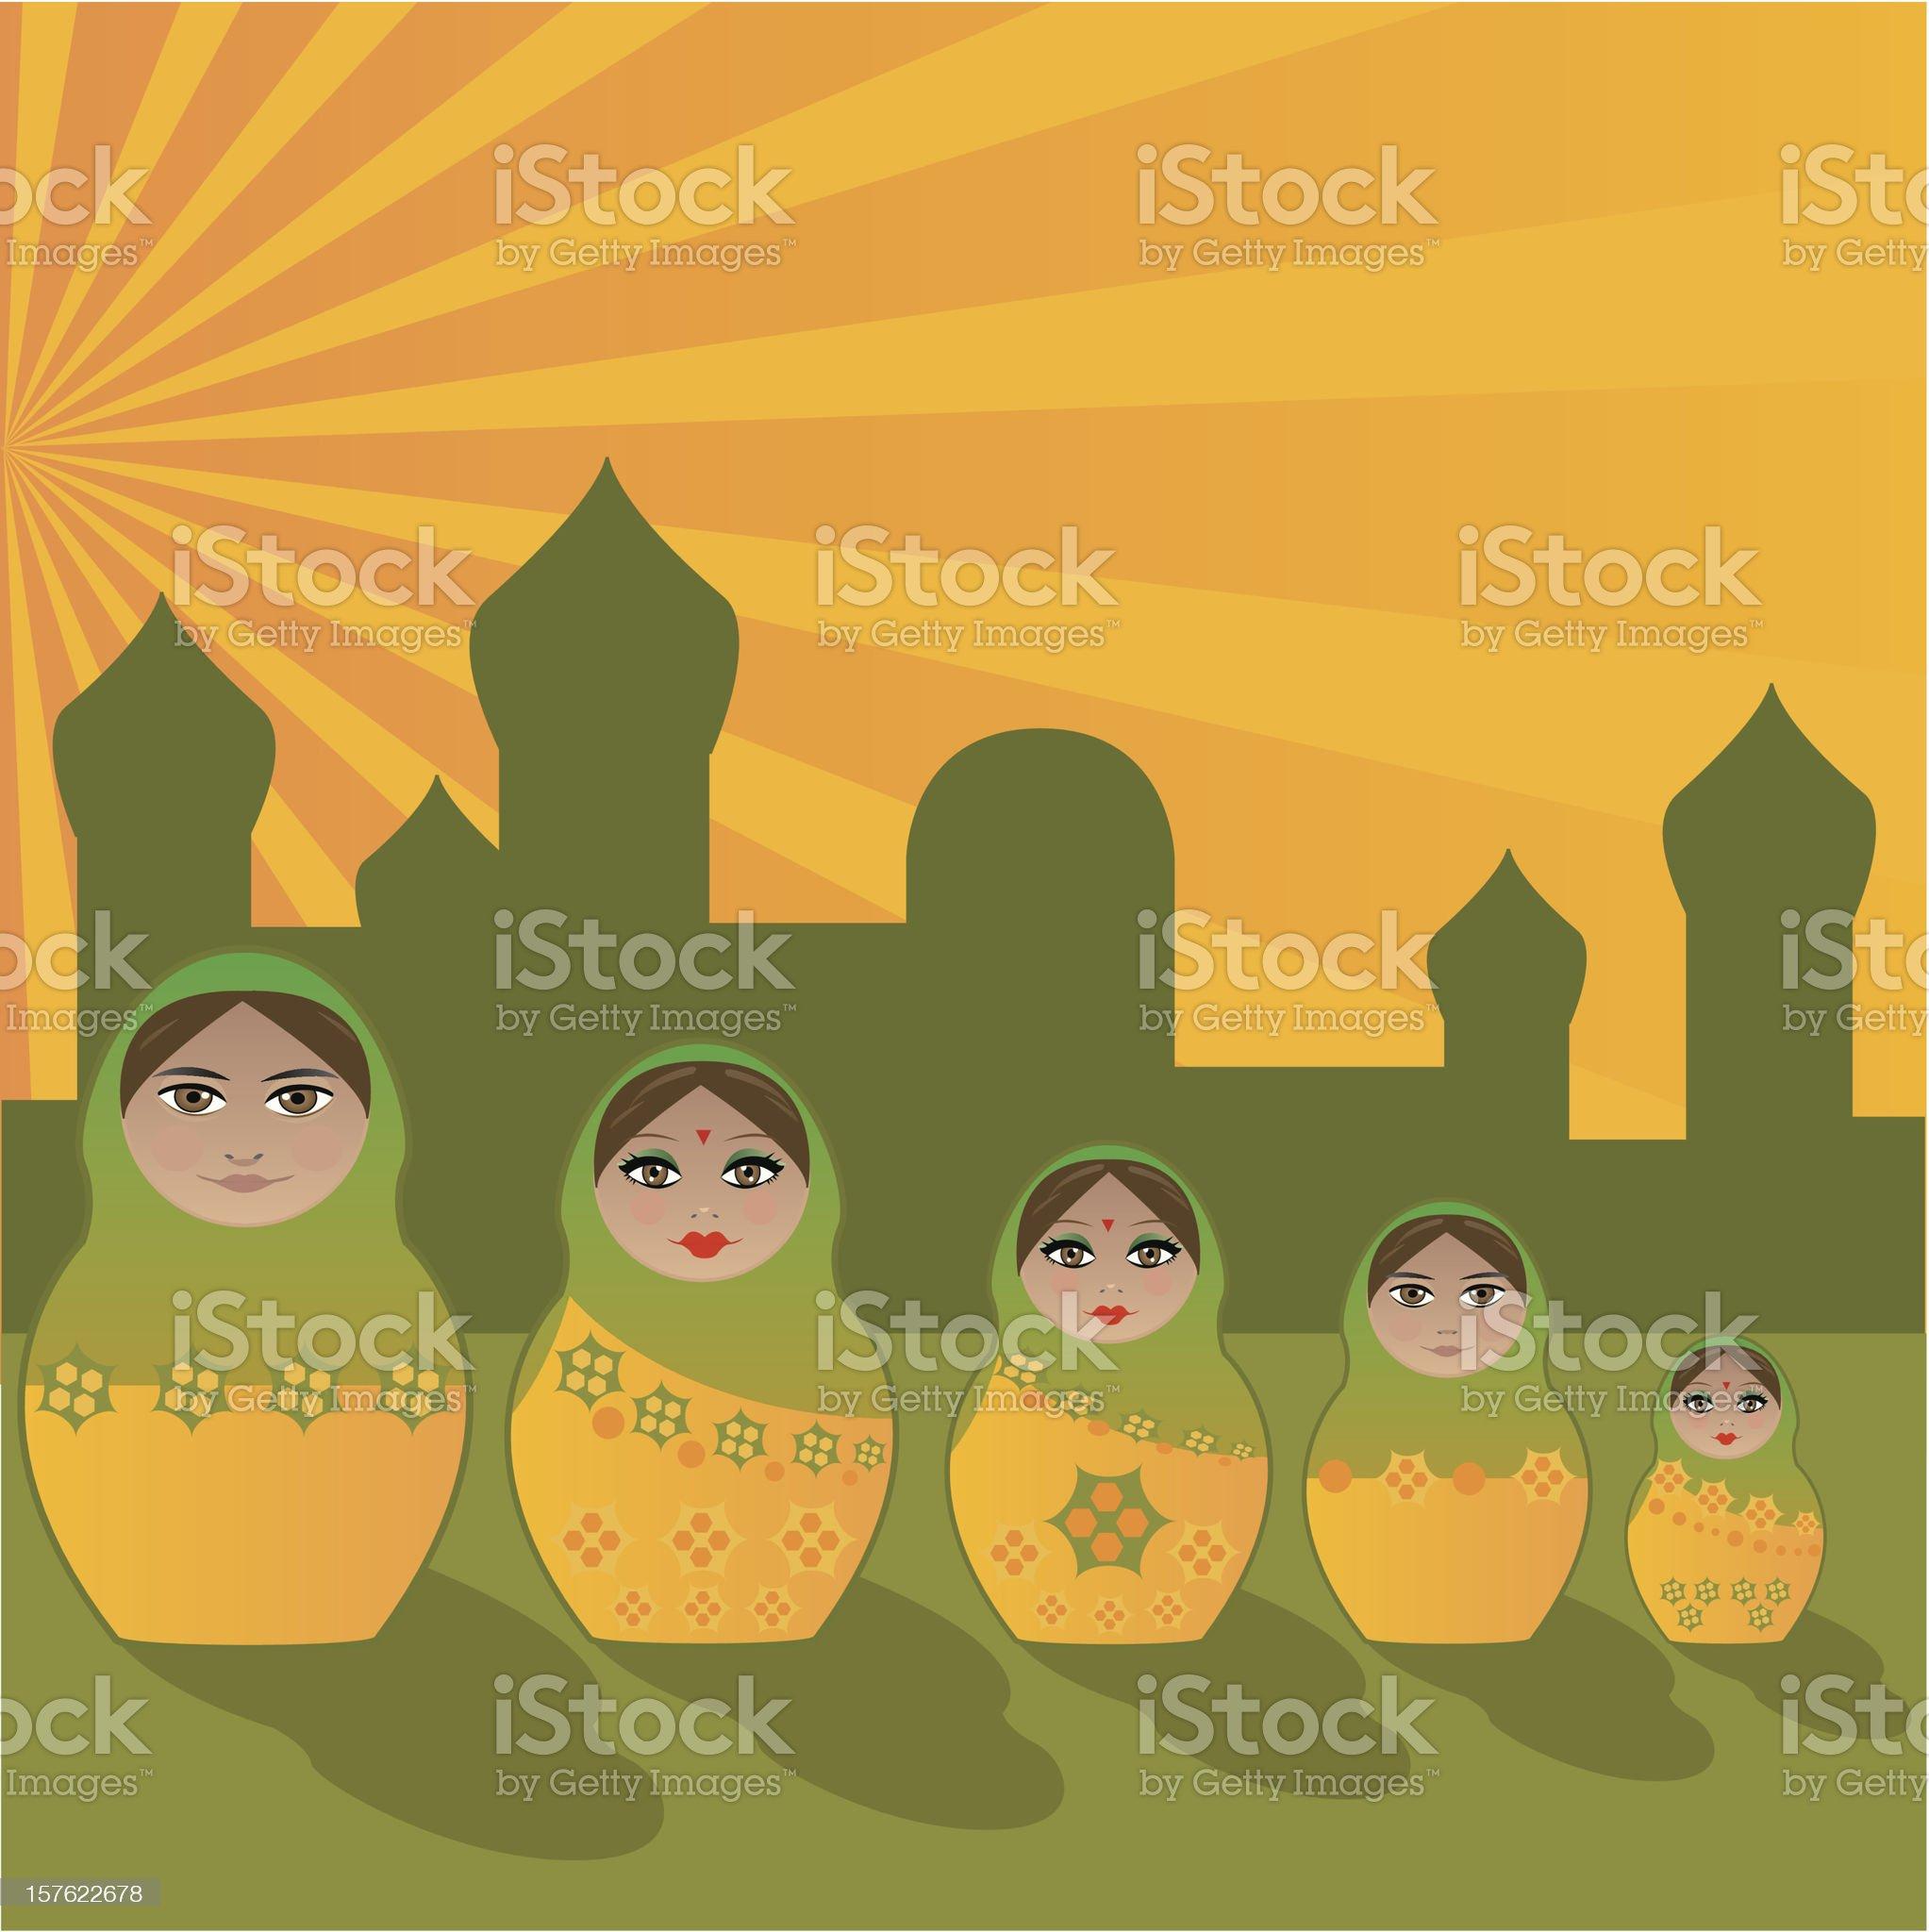 All in one - Matrioska Family India style royalty-free stock vector art